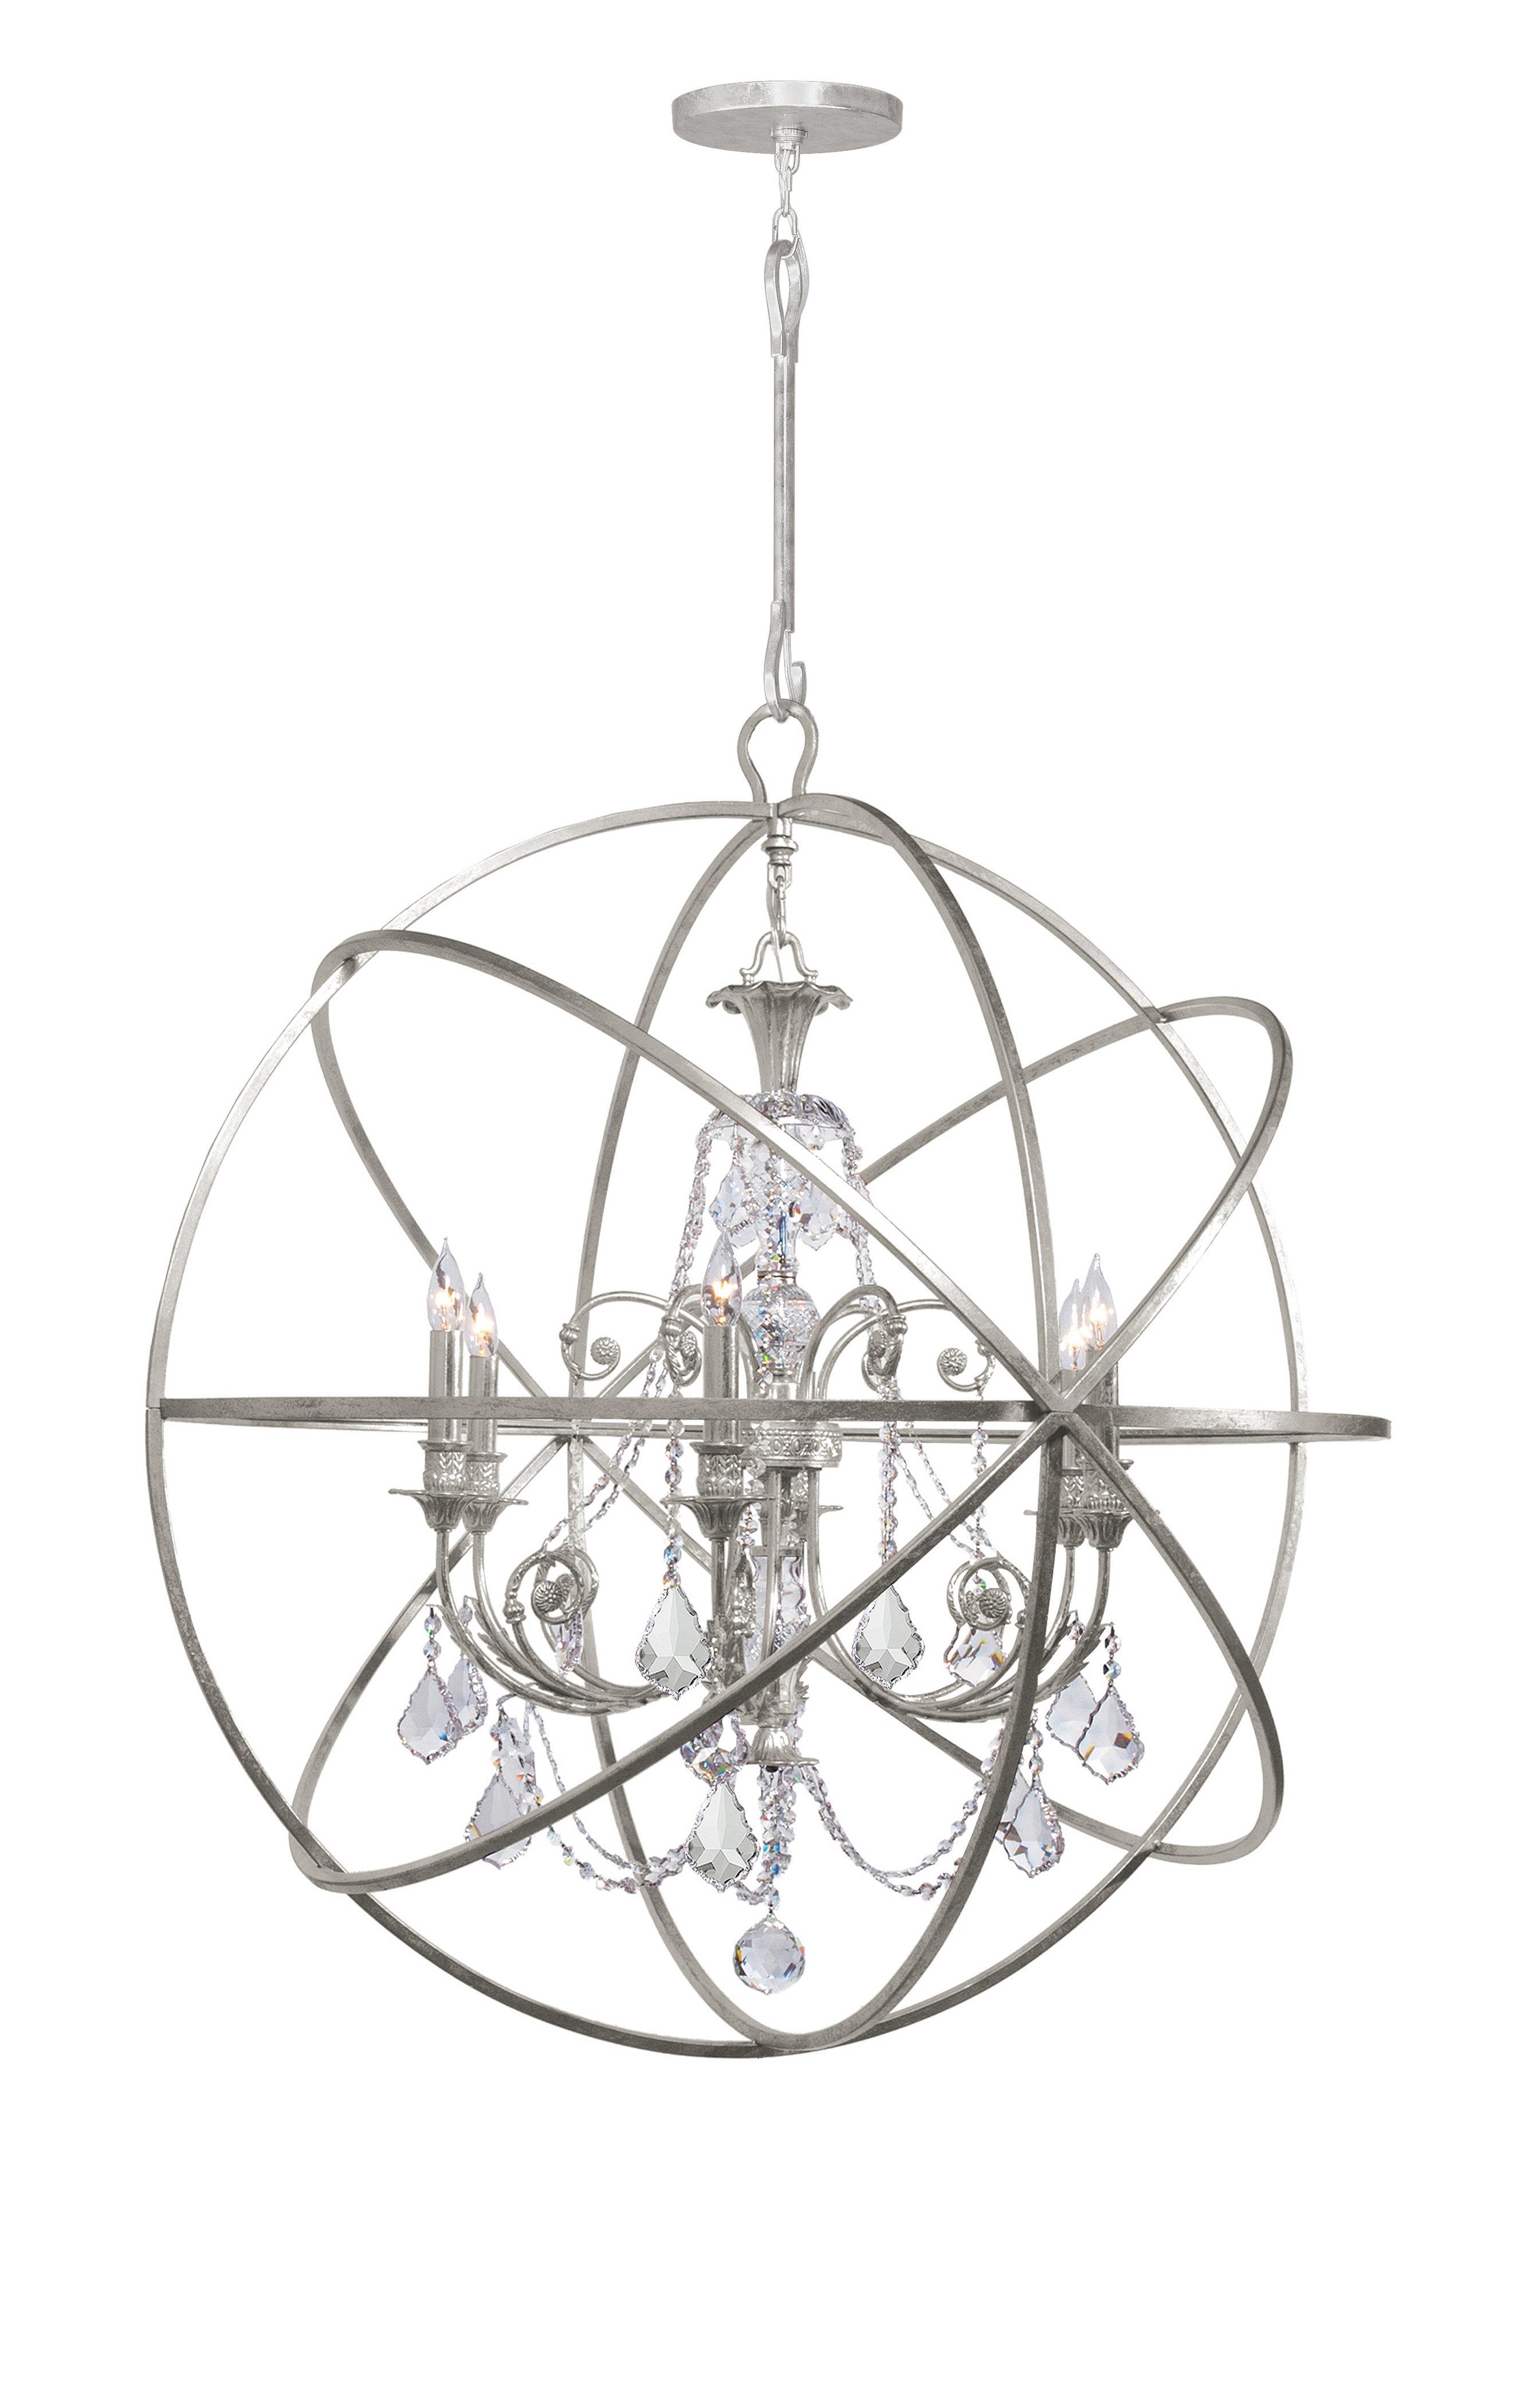 Newest Gregoire 6 Light Globe Chandelier For Gregoire 6 Light Globe Chandeliers (View 21 of 25)